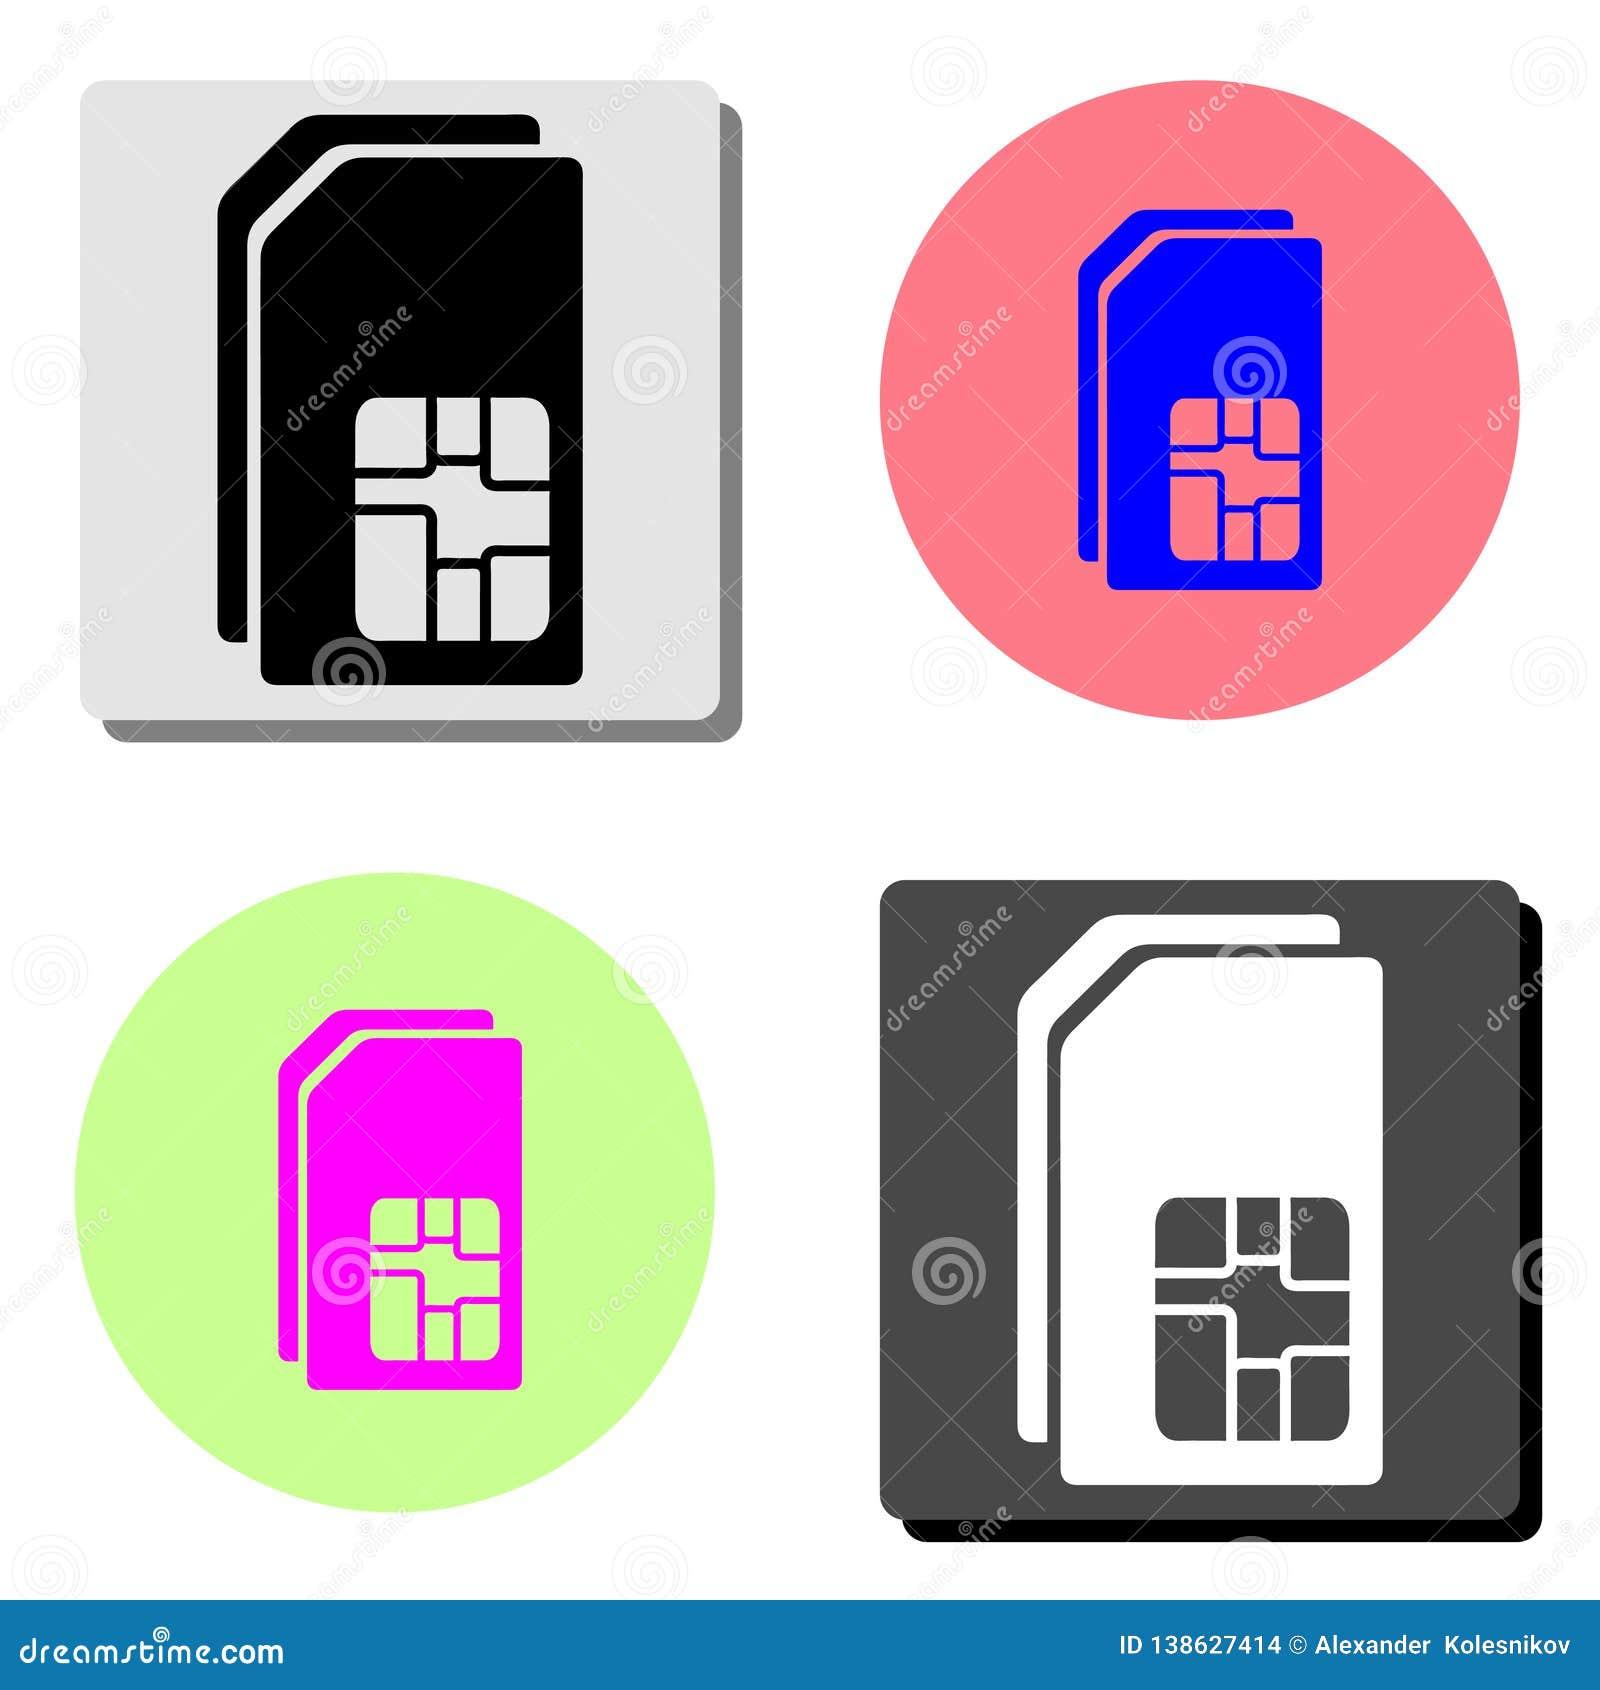 dual sim card. flat vector icon